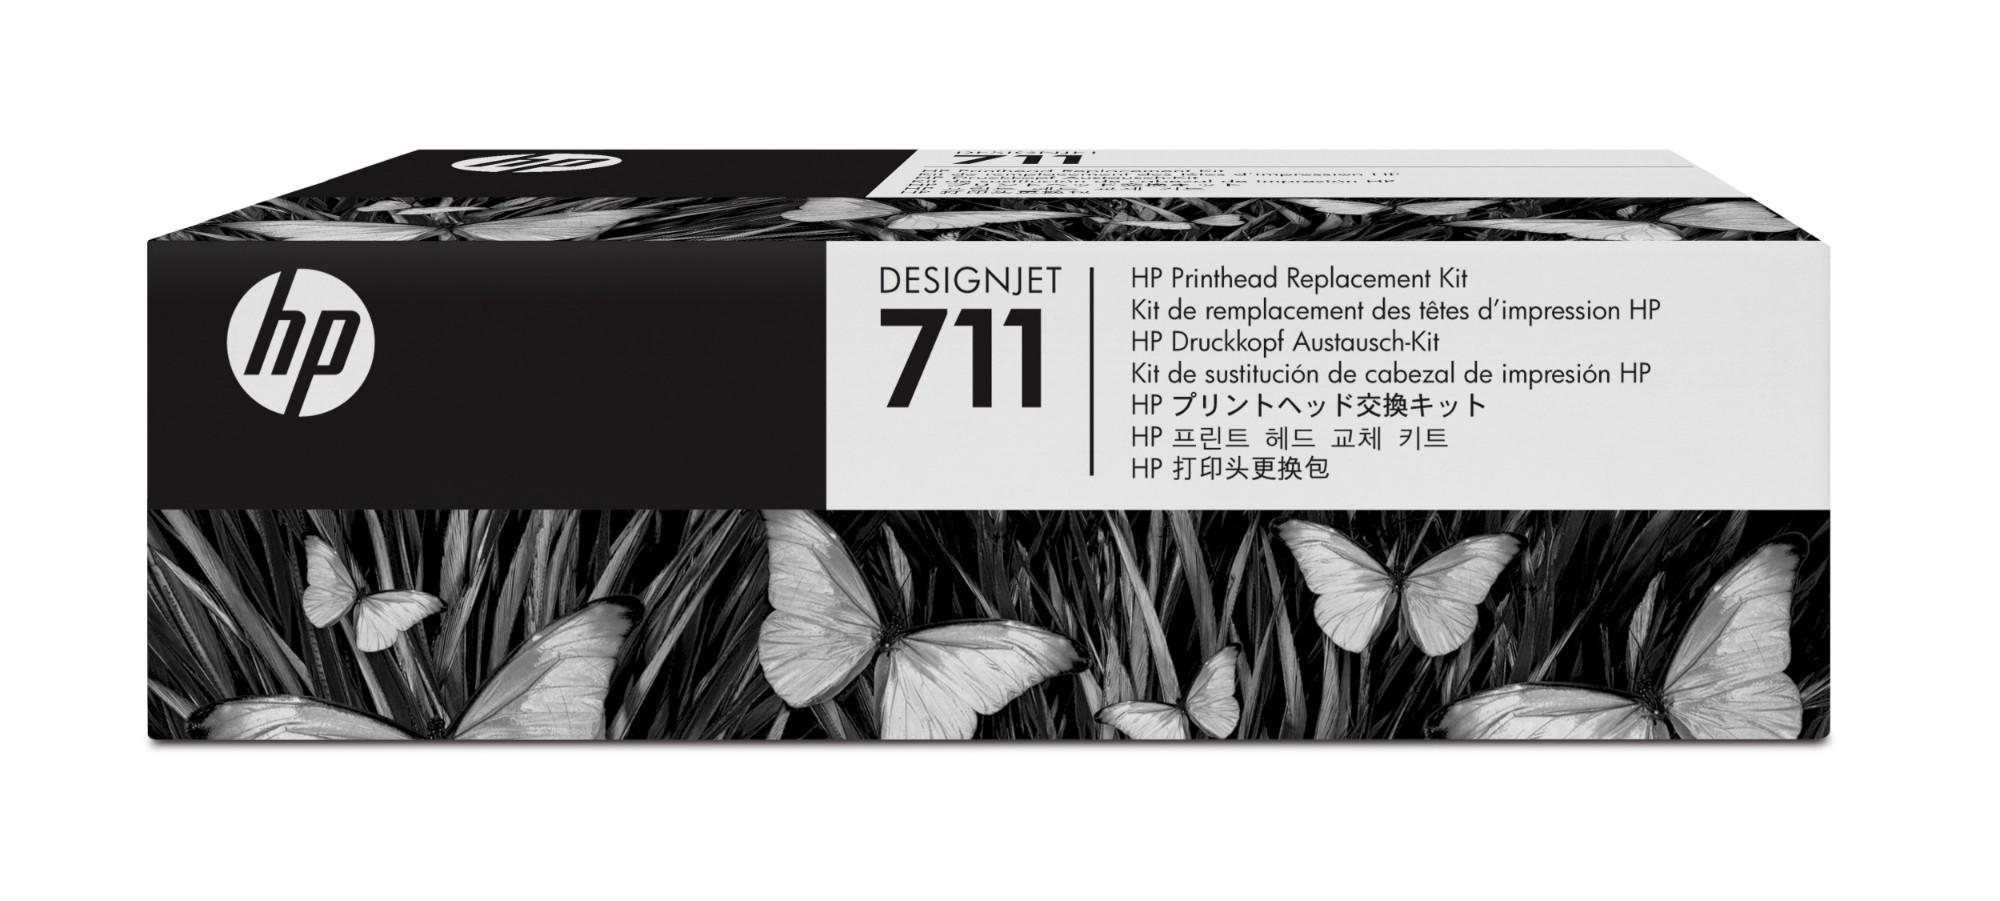 HP Kit de sustitución de cabezal de impresión DesignJet 711